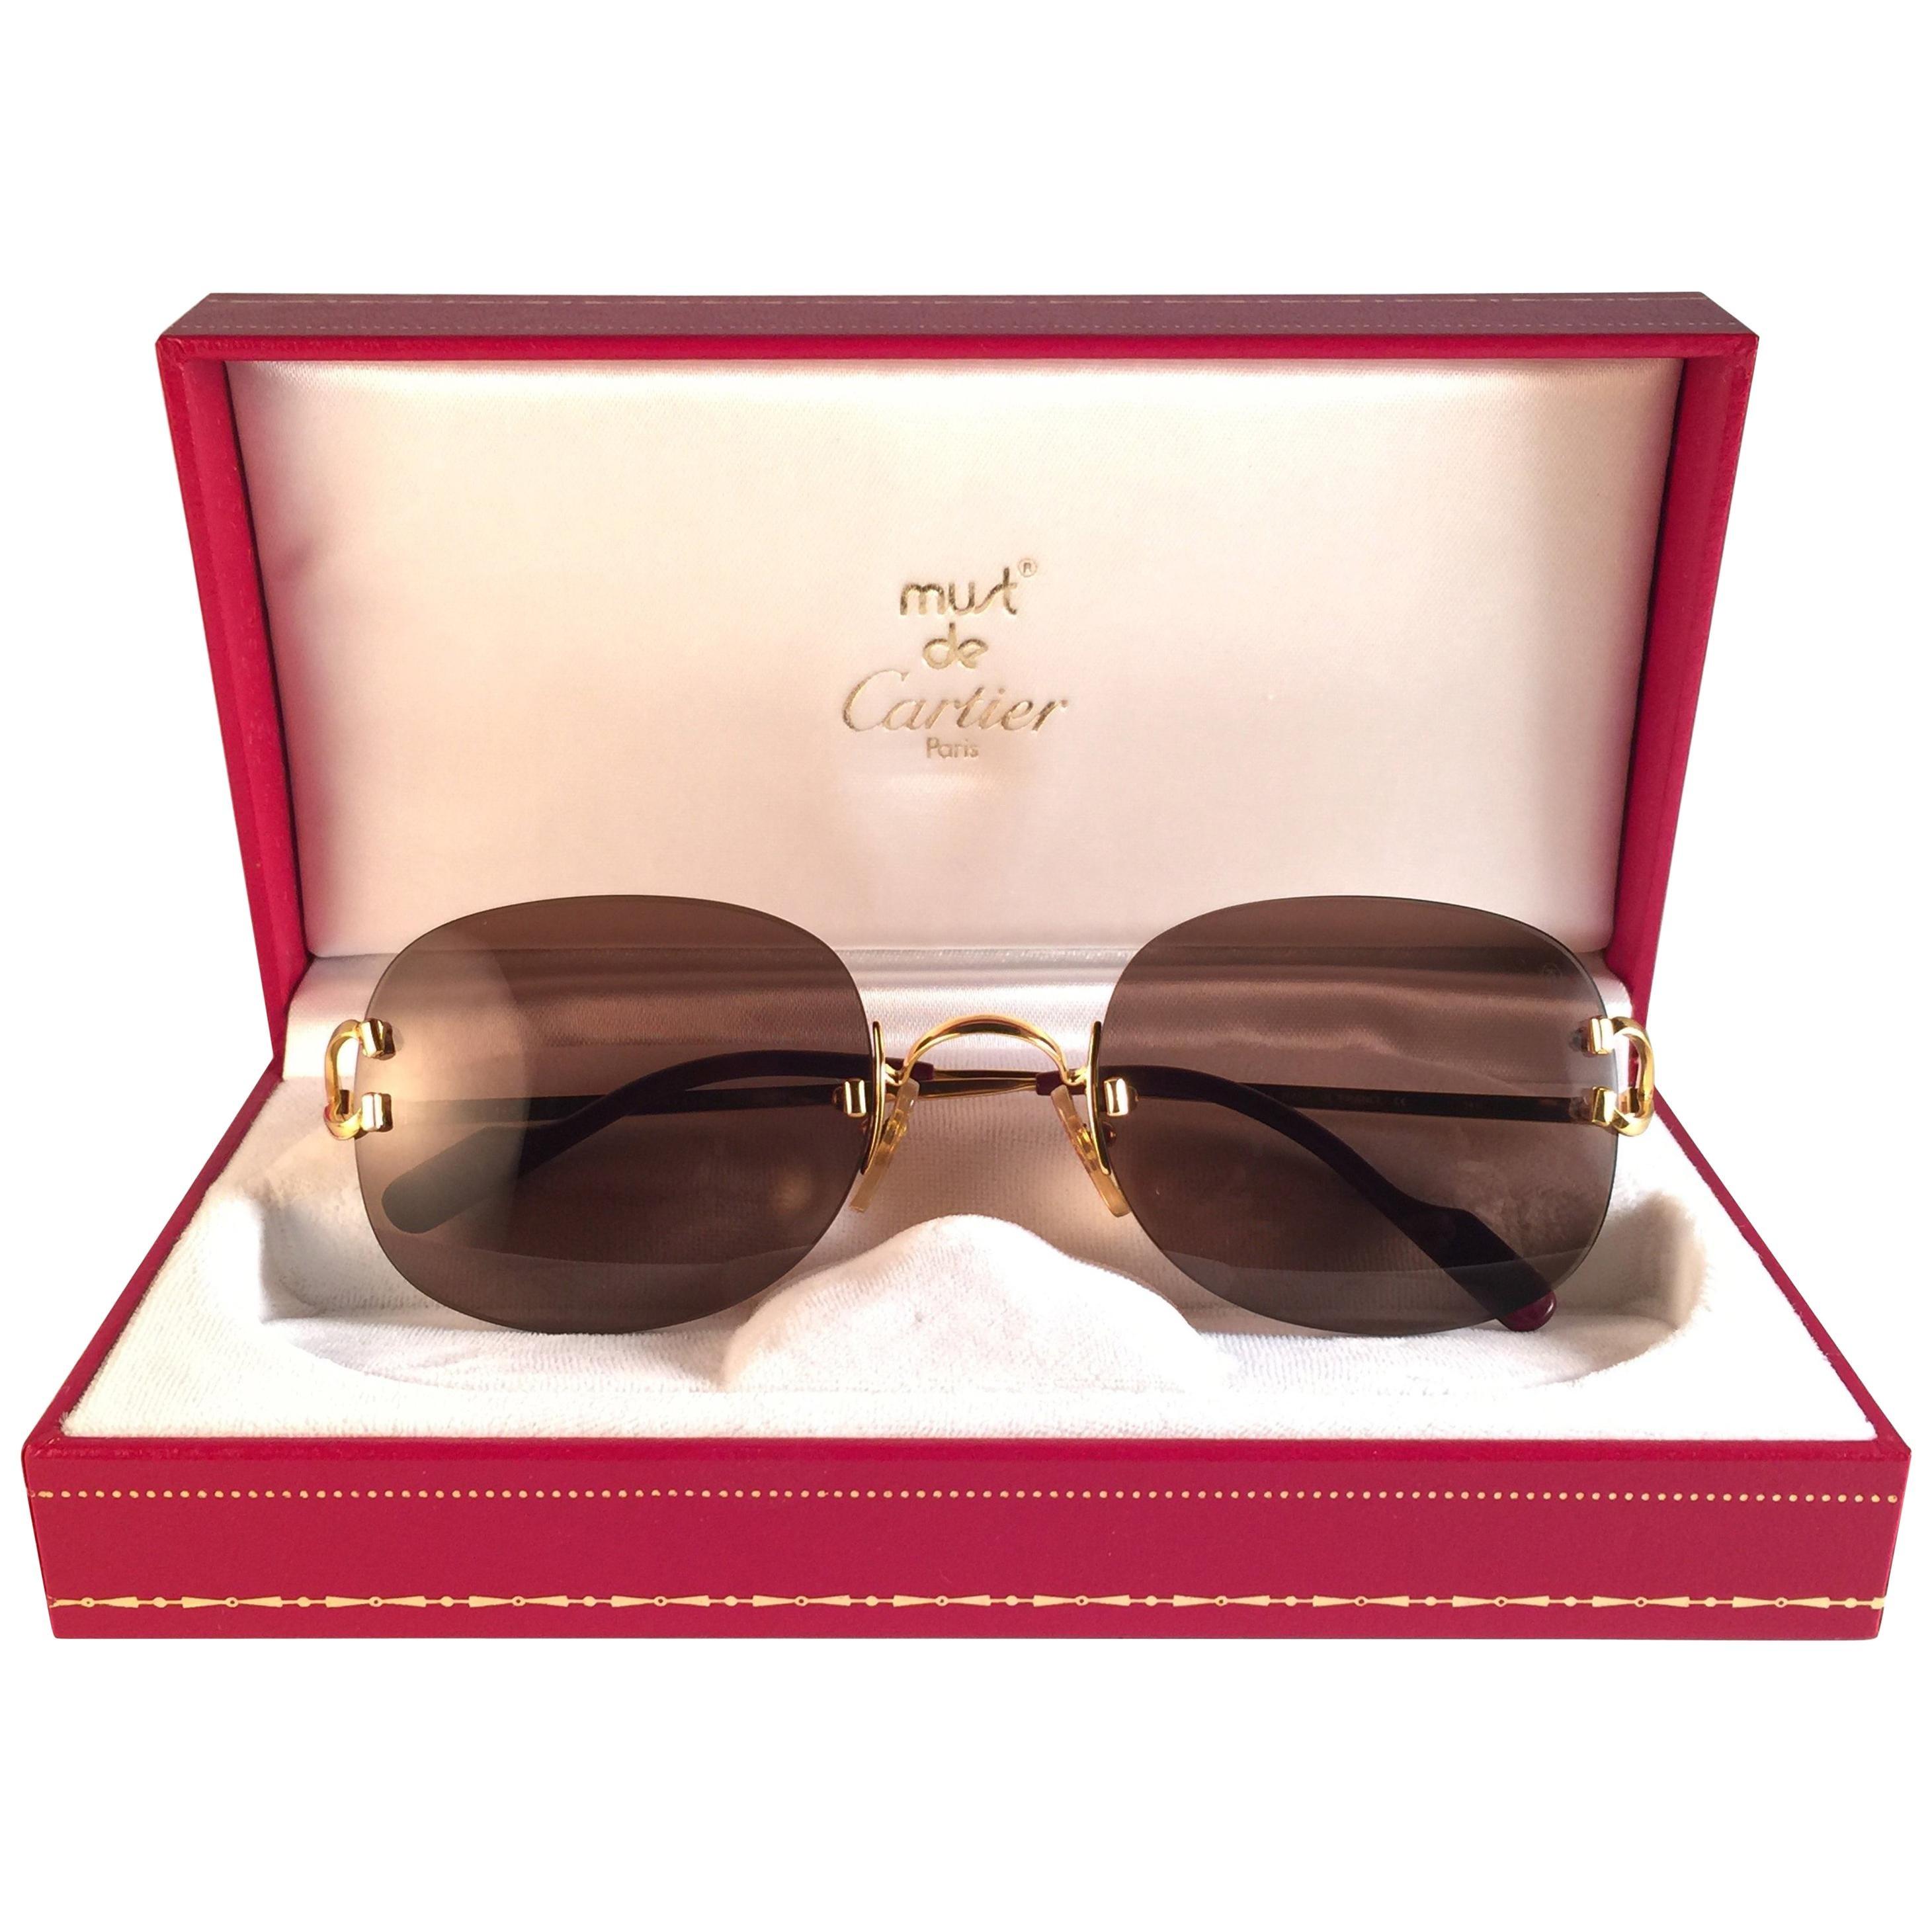 438576d93379 Vintage Cartier Sunglasses - 158 For Sale at 1stdibs